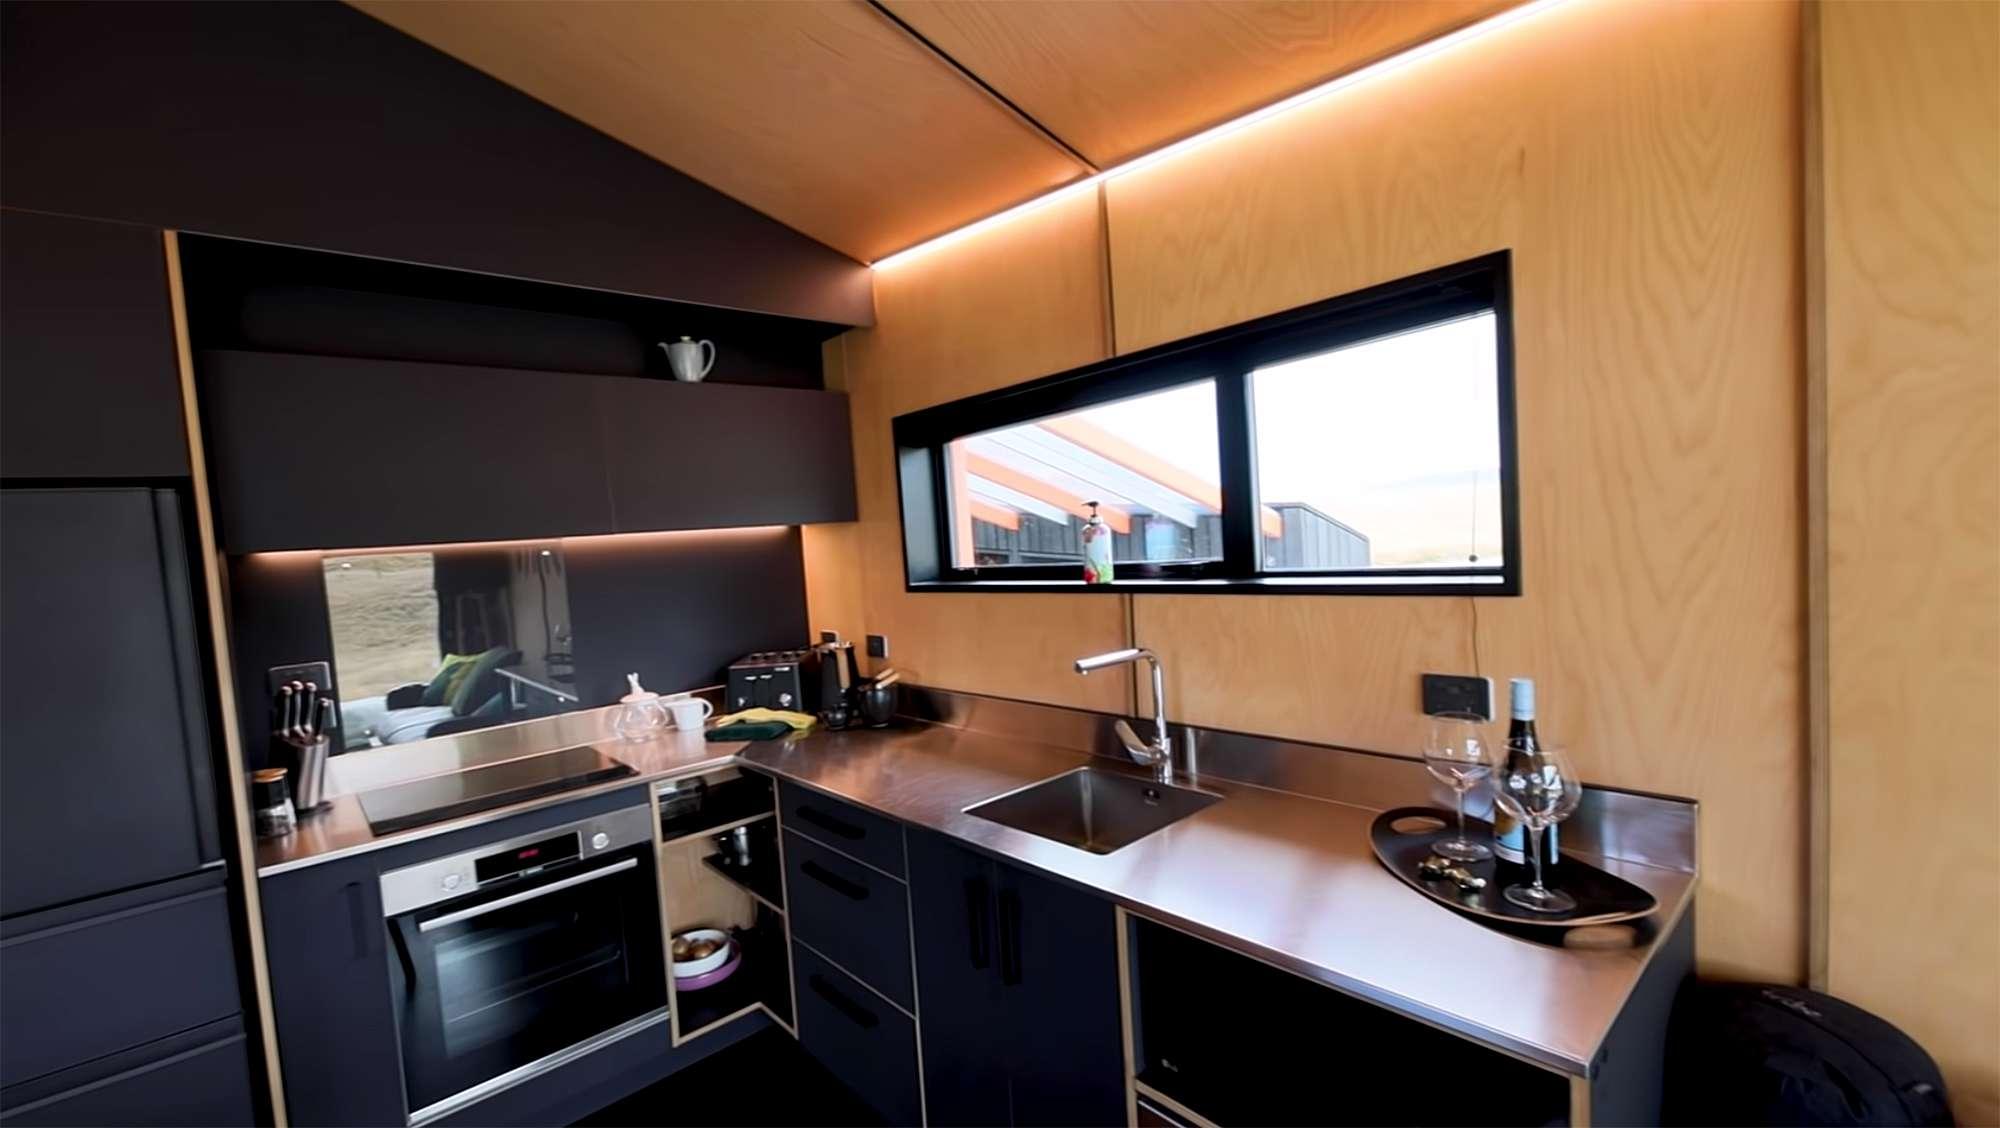 Skylark Cabin by Barry Connor kitchen